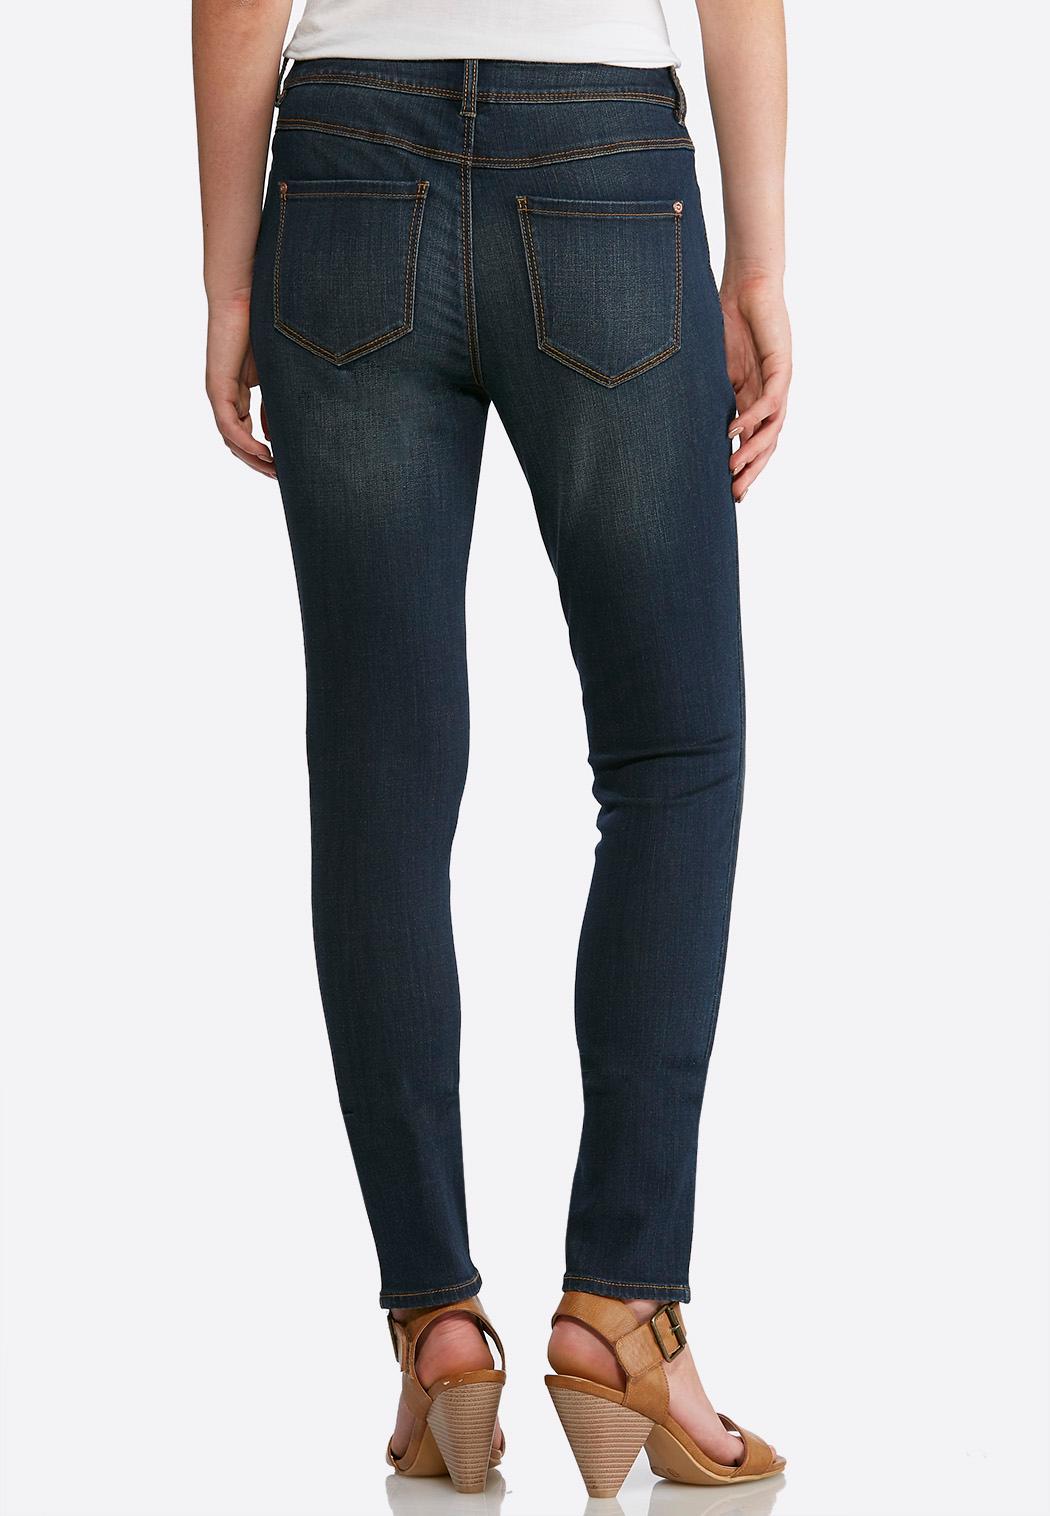 Rinse Wash Skinny Jeans (Item #43534710)